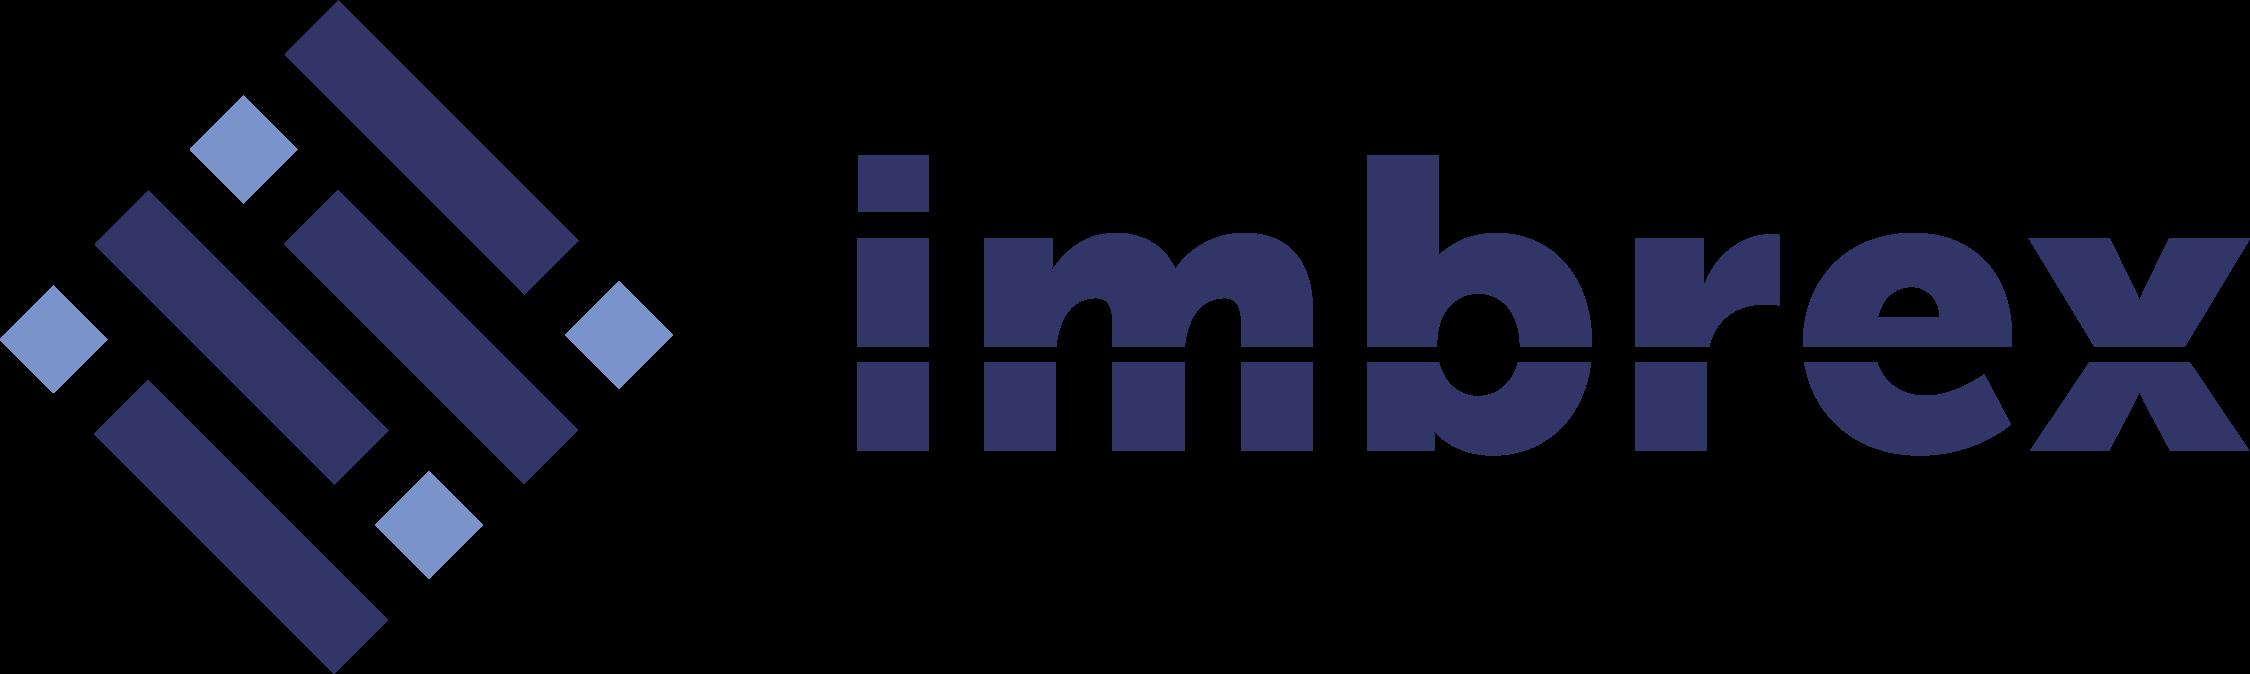 Imbrex_Logo.png